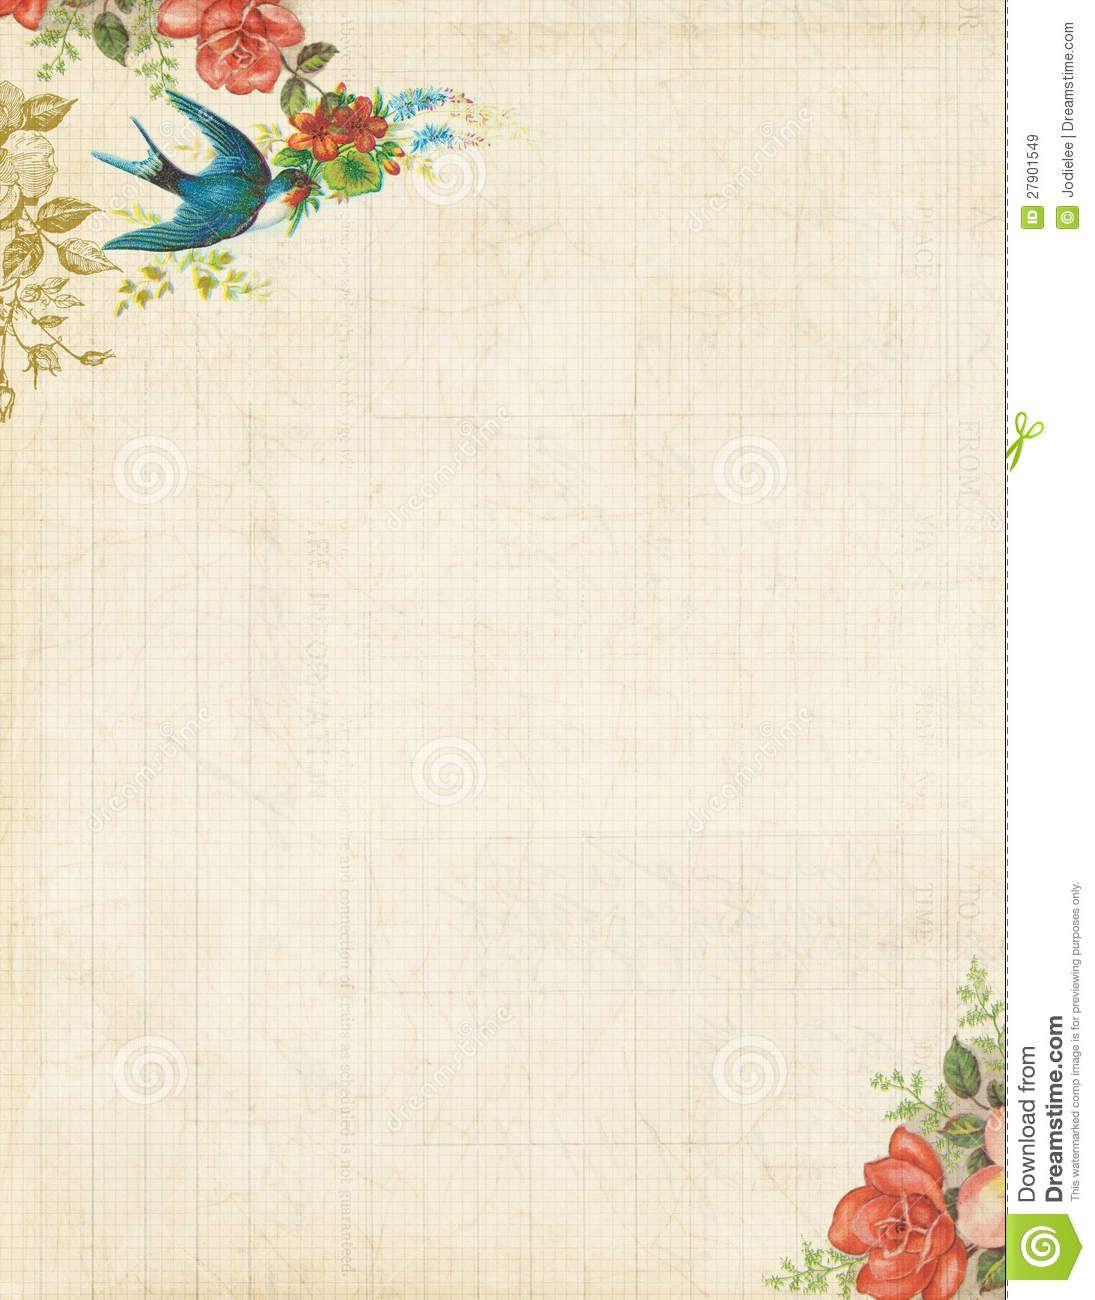 Free Printable Stationery Vintage Backgrounds - 8.4.kaartenstemp.nl • - Free Printable Backgrounds For Paper